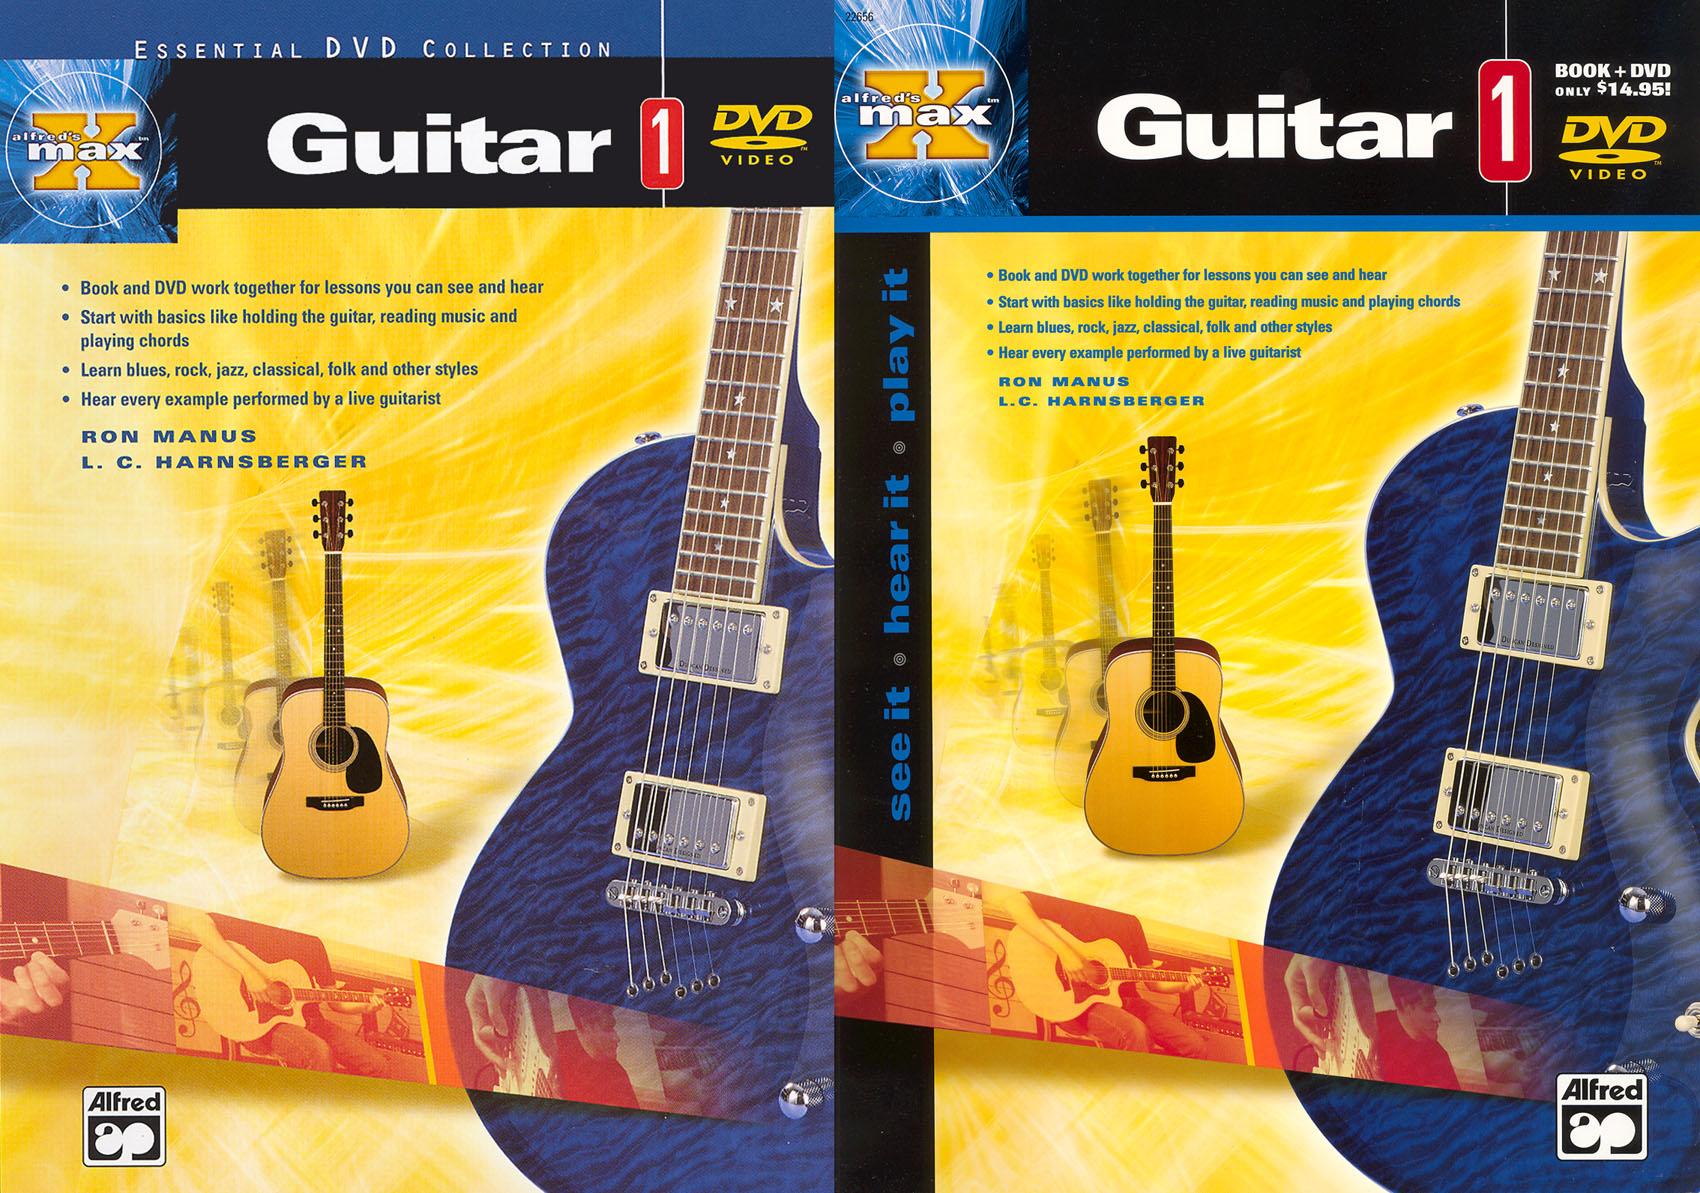 Alfred's Max Guitar, Vol. 1